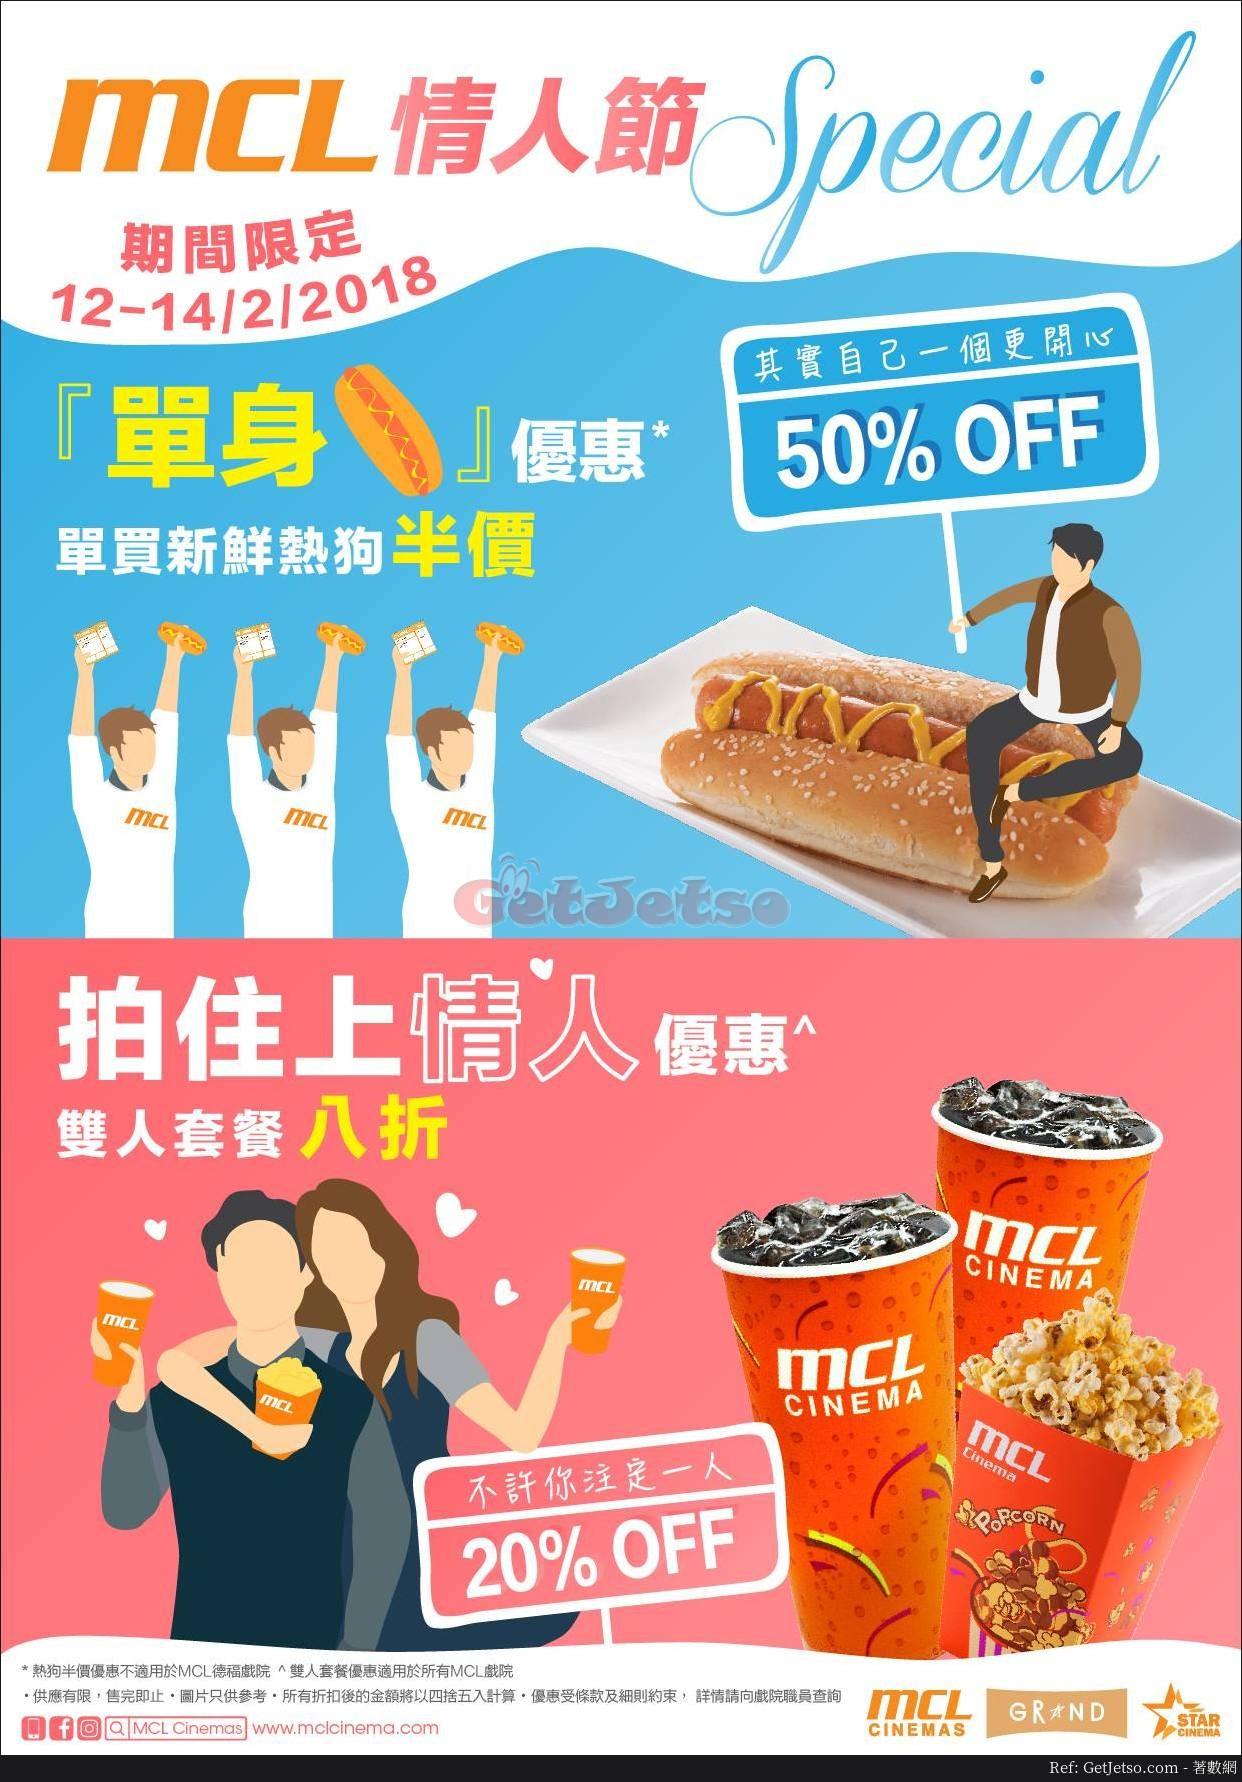 MCL Cinemas 低至5折情人節熱狗套餐優惠(至18年2月14日)